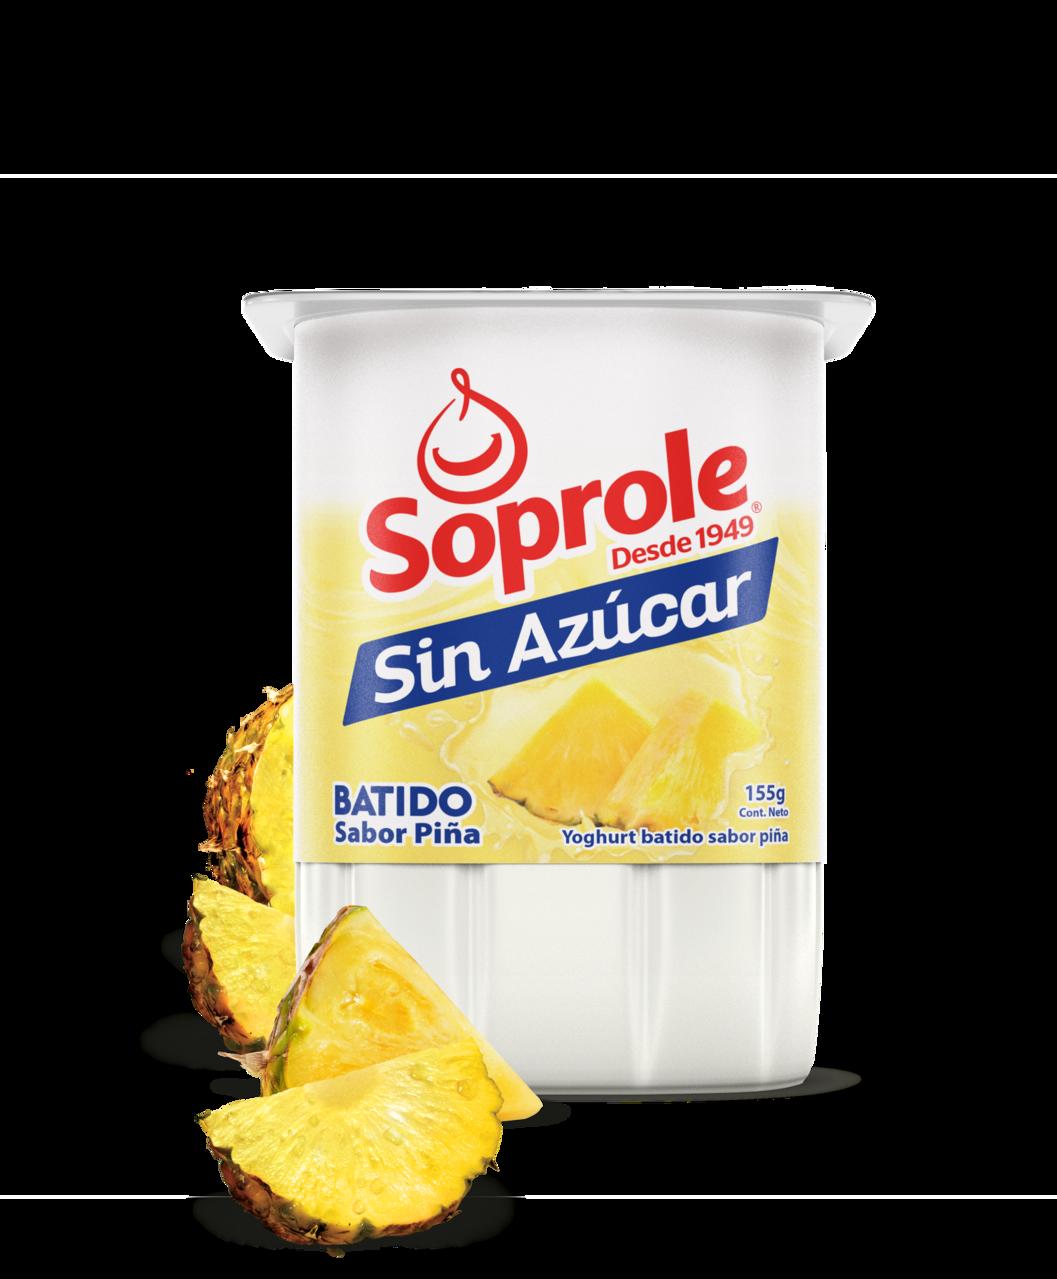 Soprole Yoghurt Batido Light sabor piña 165